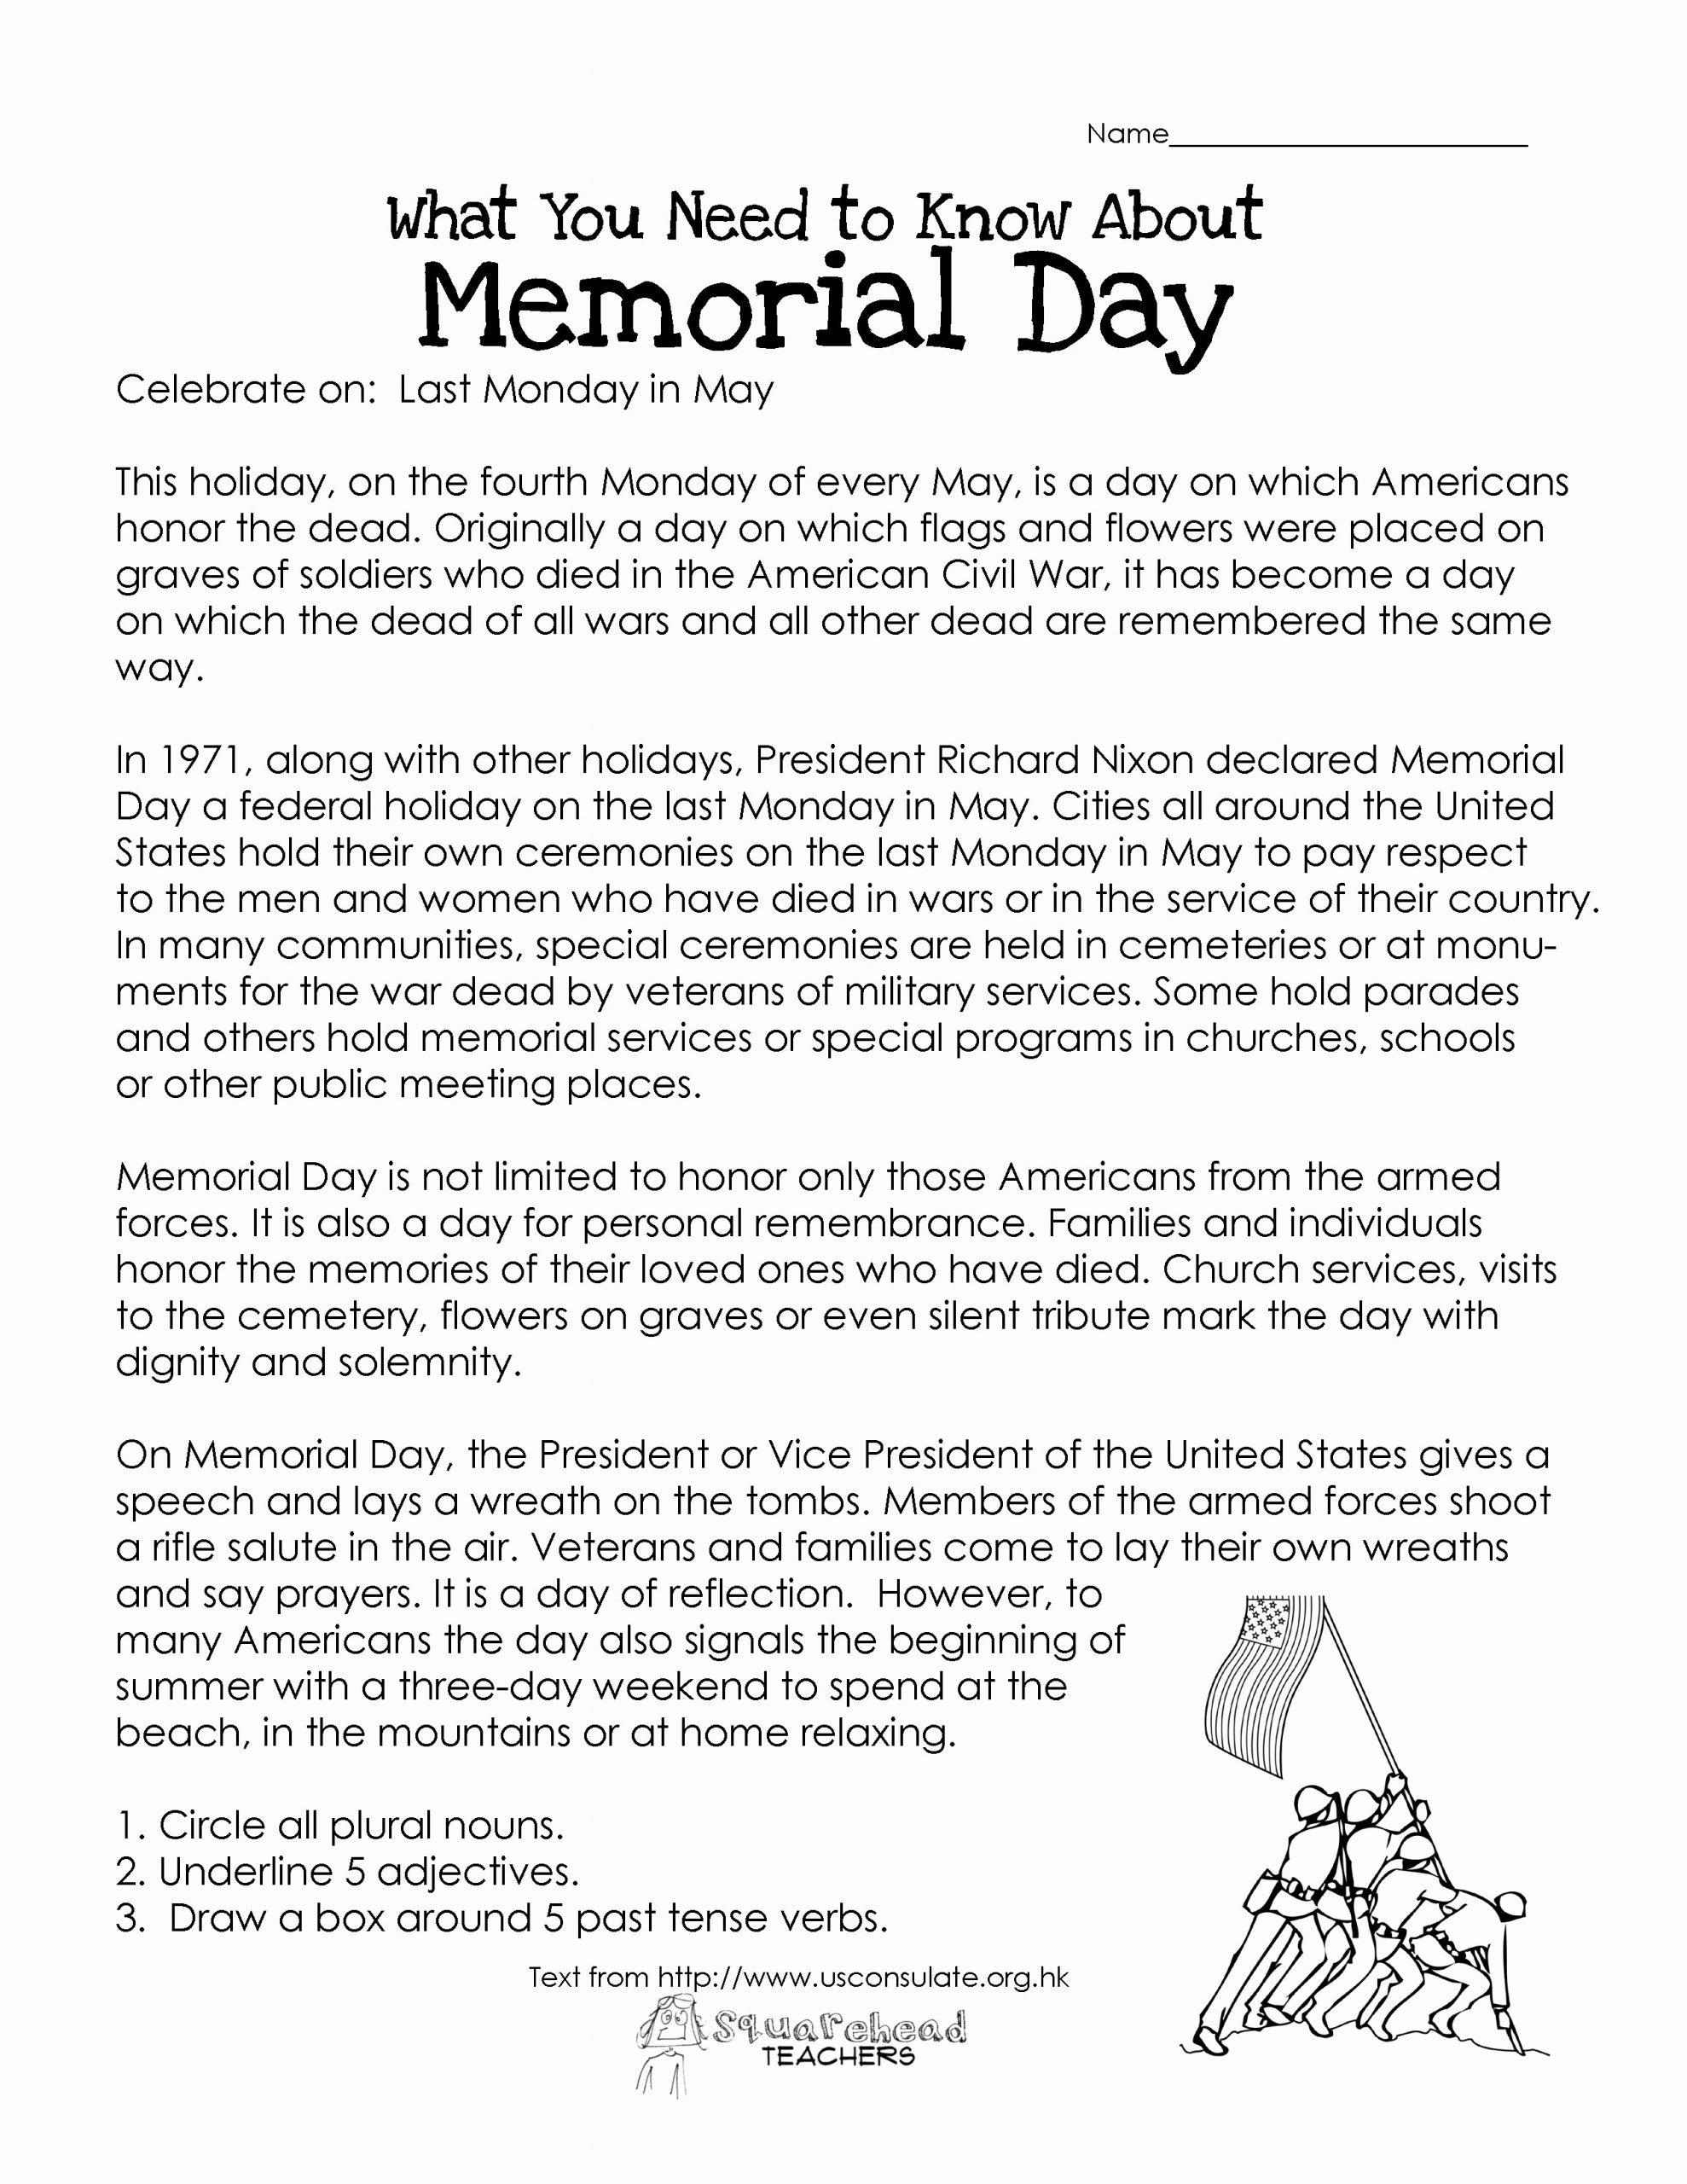 Memorial Day Worksheets Free Printable Inspirational Memorial Day Free Worksheet